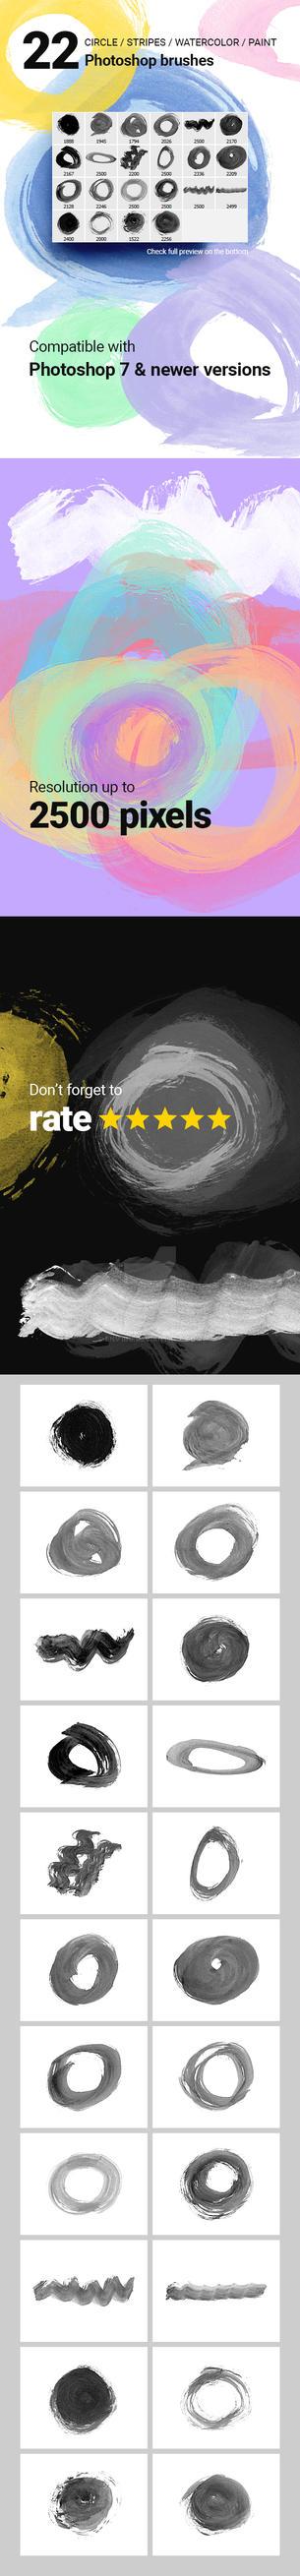 22 Circles Badges Watercolor Photoshop Brushes